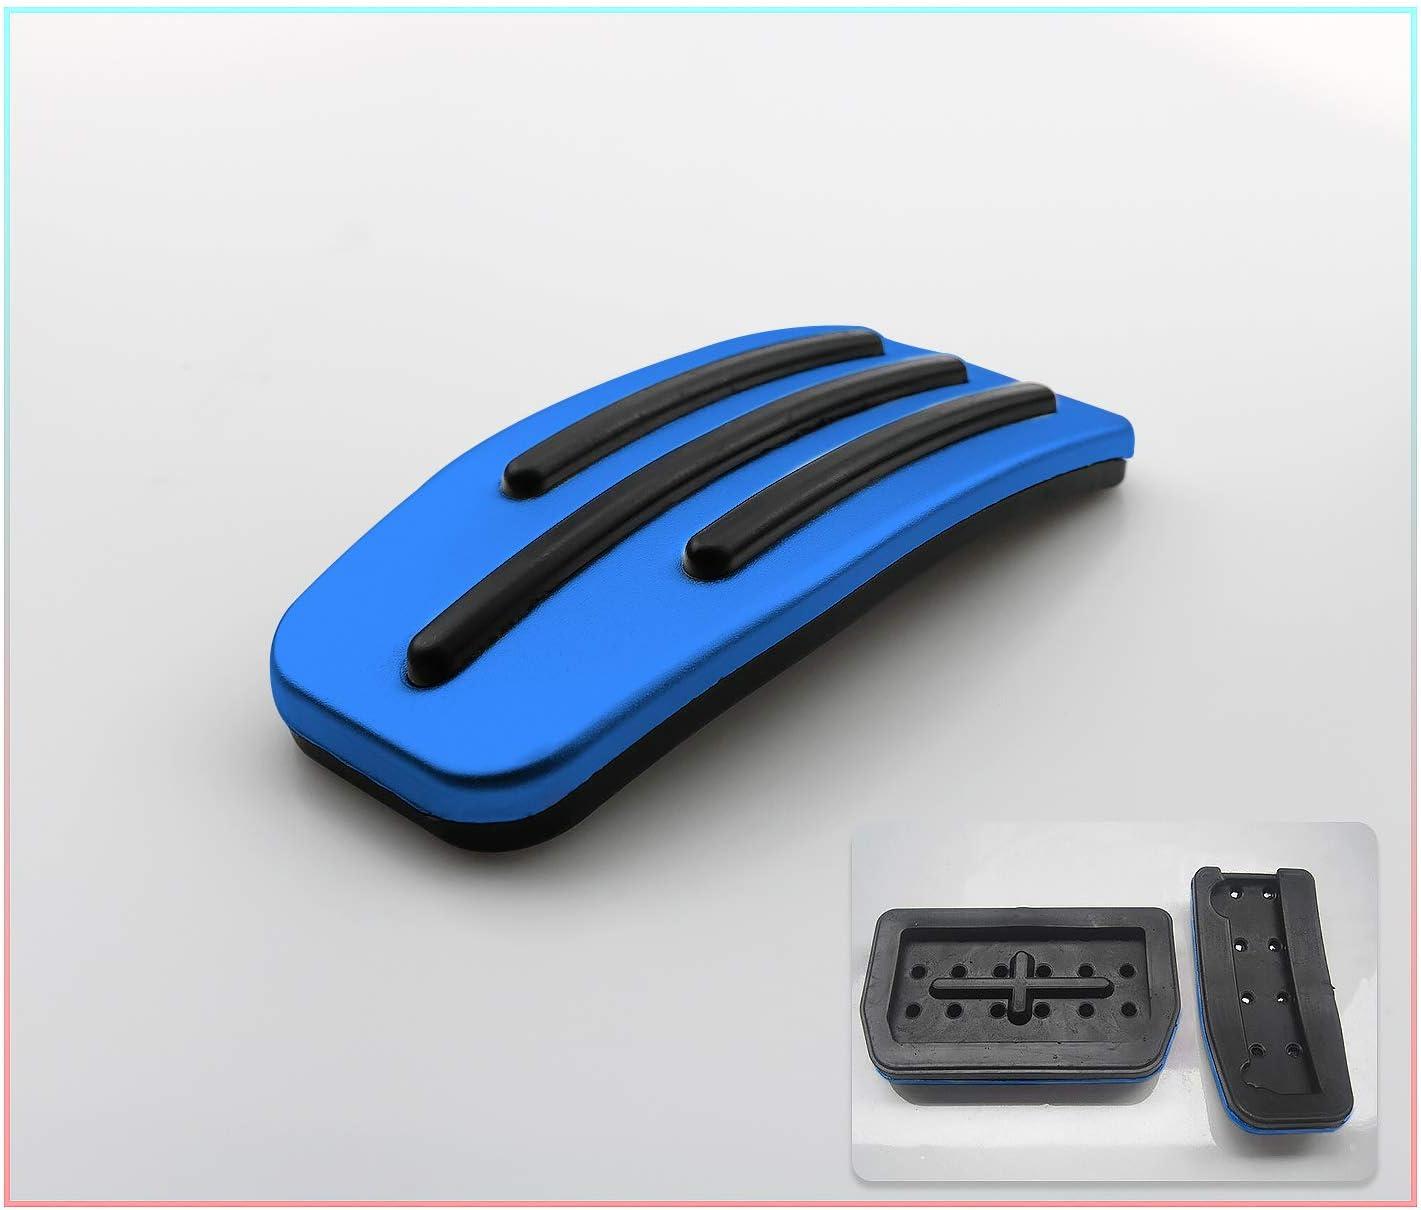 Cdefg Für Model 3 Auto Pedale Bremse Gaspeda Aluminiumlegierung Fußstütze Anti Rutsch Bremse Pedalkappen Blau Auto